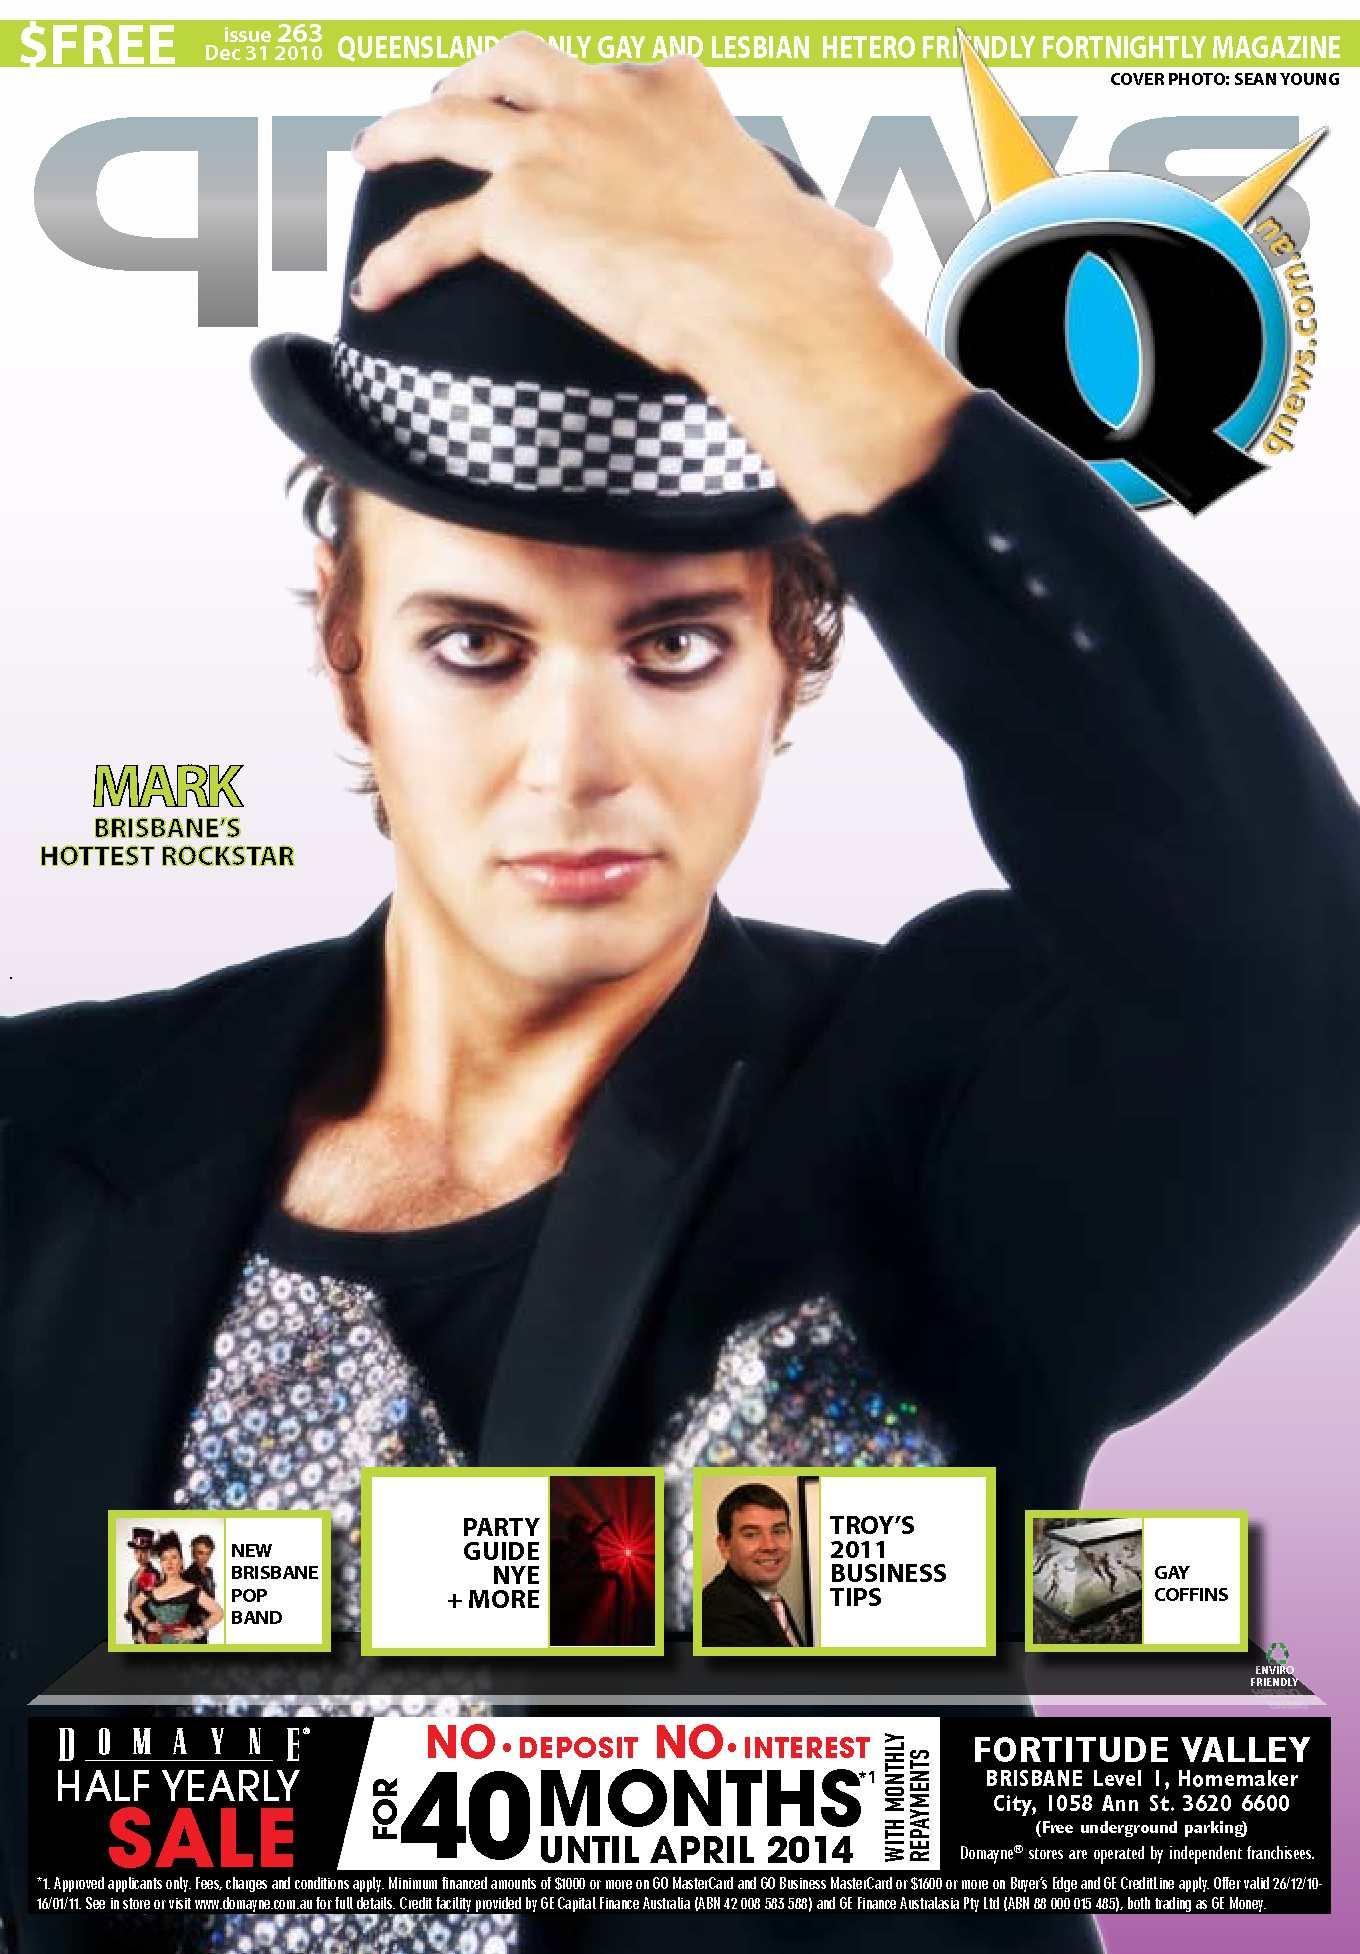 gay magazine queensland